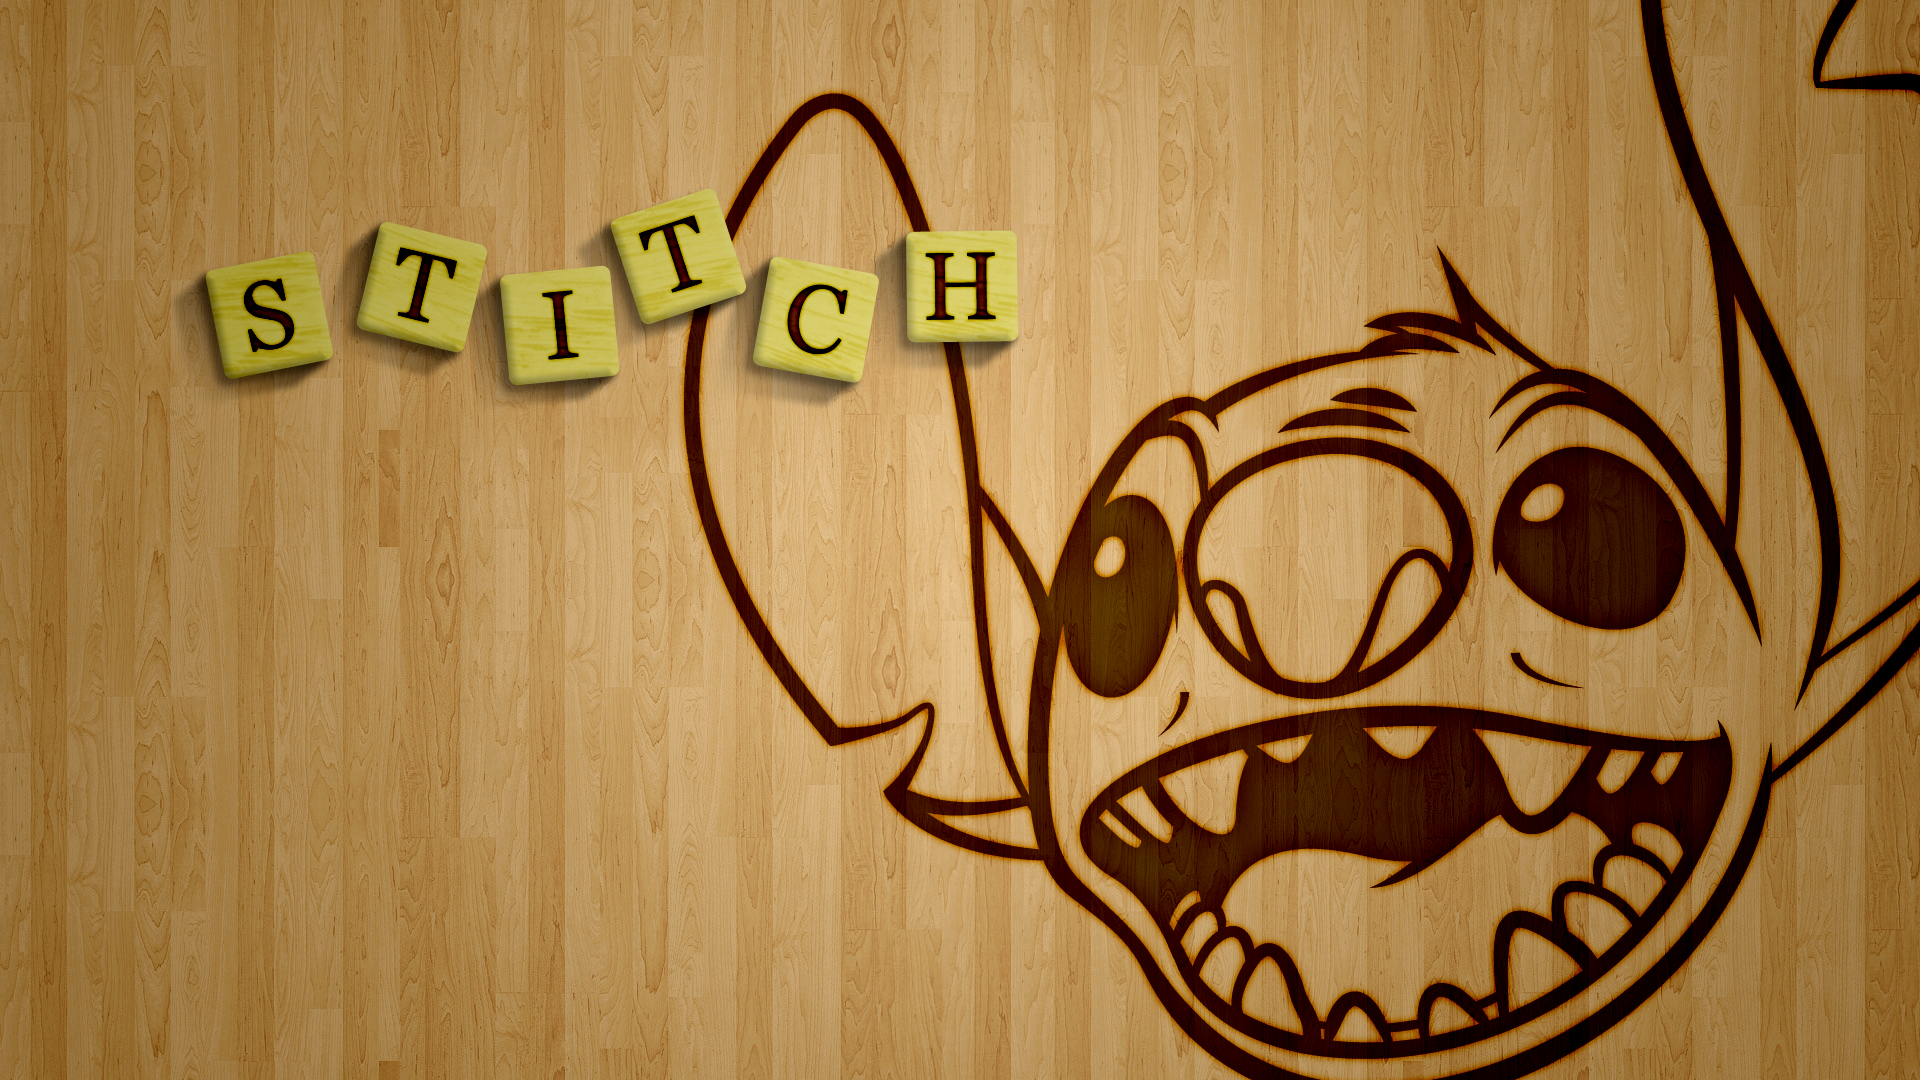 Lilo Stitch Full HD Wallpaper And Background Image